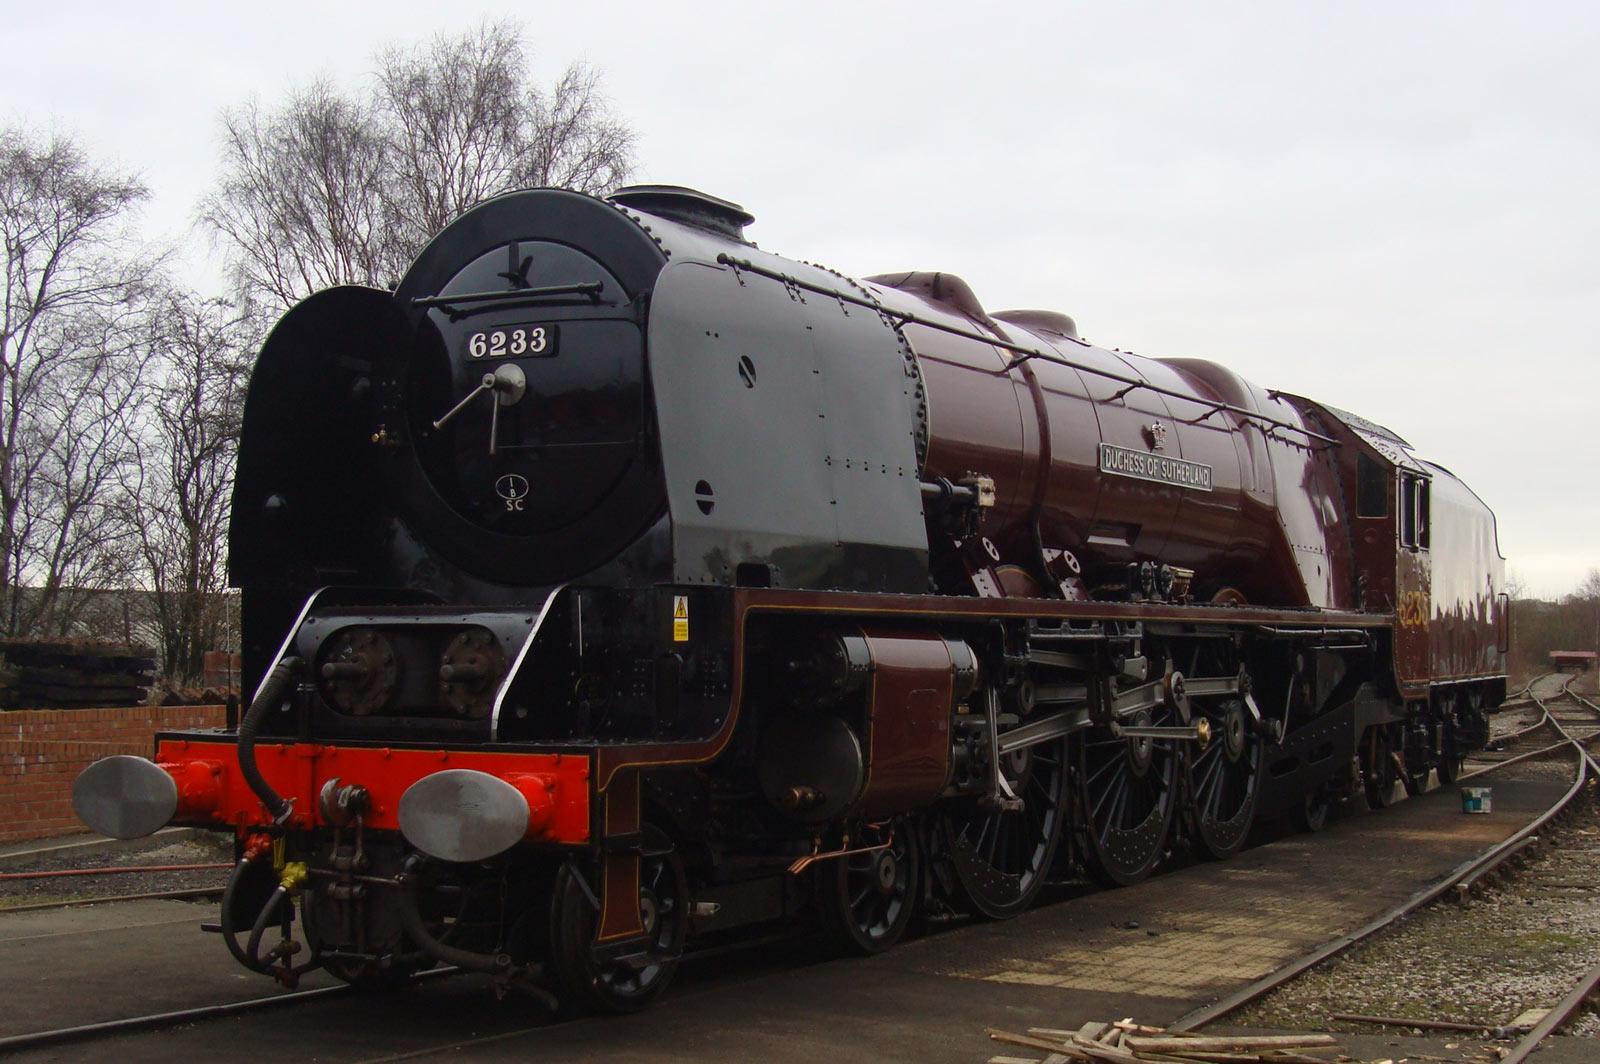 Steam Train Image Steam trains wallpaper